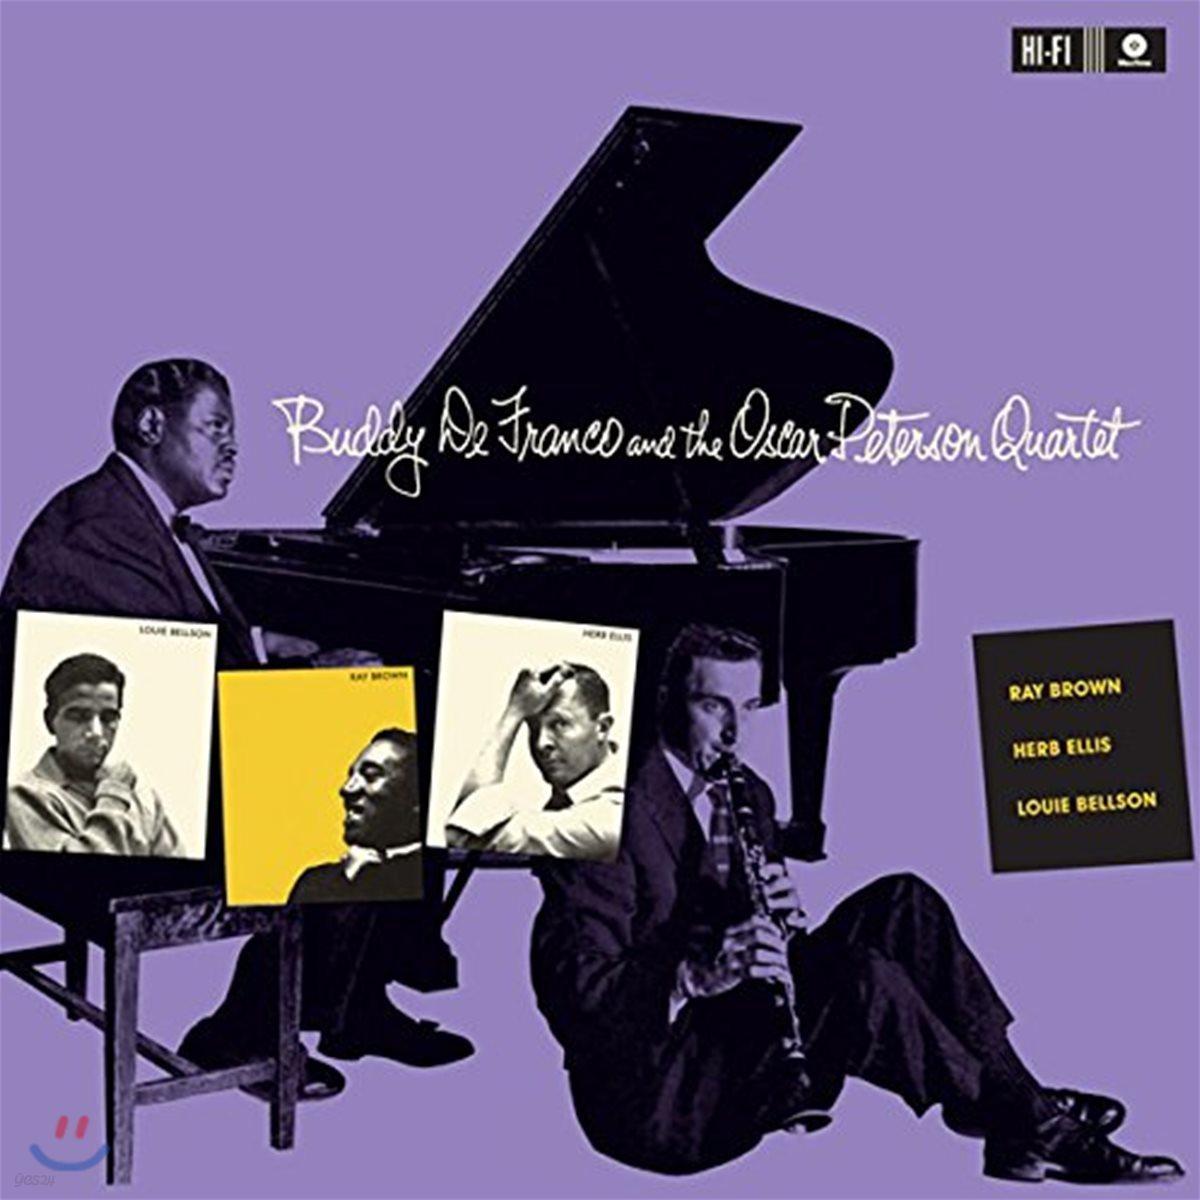 Buddy DeFranco / Oscar Peterson (버디 드프랑코 / 오스카 피터슨) - Buddy DeFranco And The Oscar Peterson Quartet [LP]